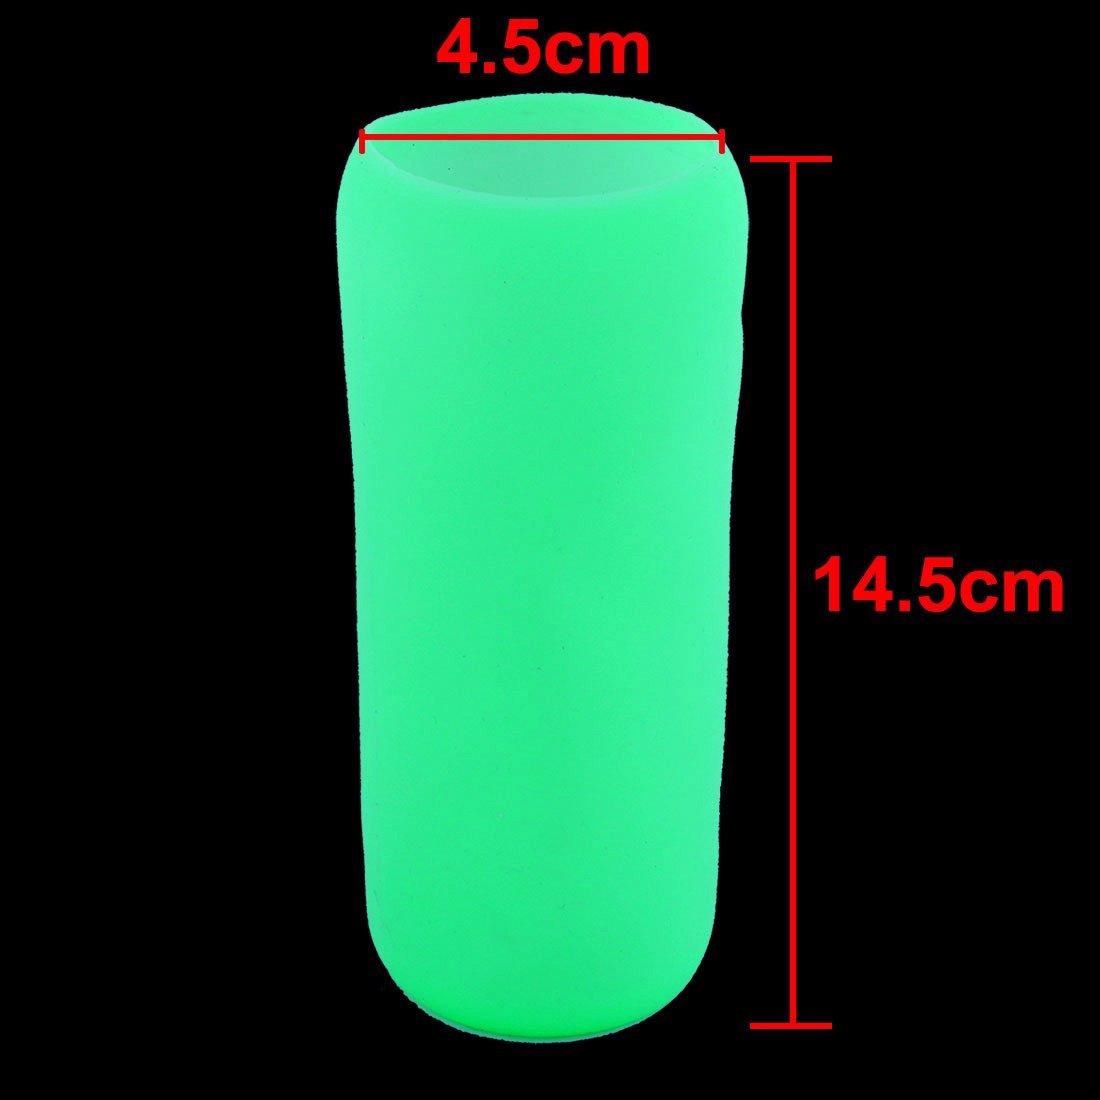 Amazon.com: Vidrio resistente eDealMax silicona Home Cafe calor taza de la botella té café manga del protector de la luz verde: Kitchen & Dining